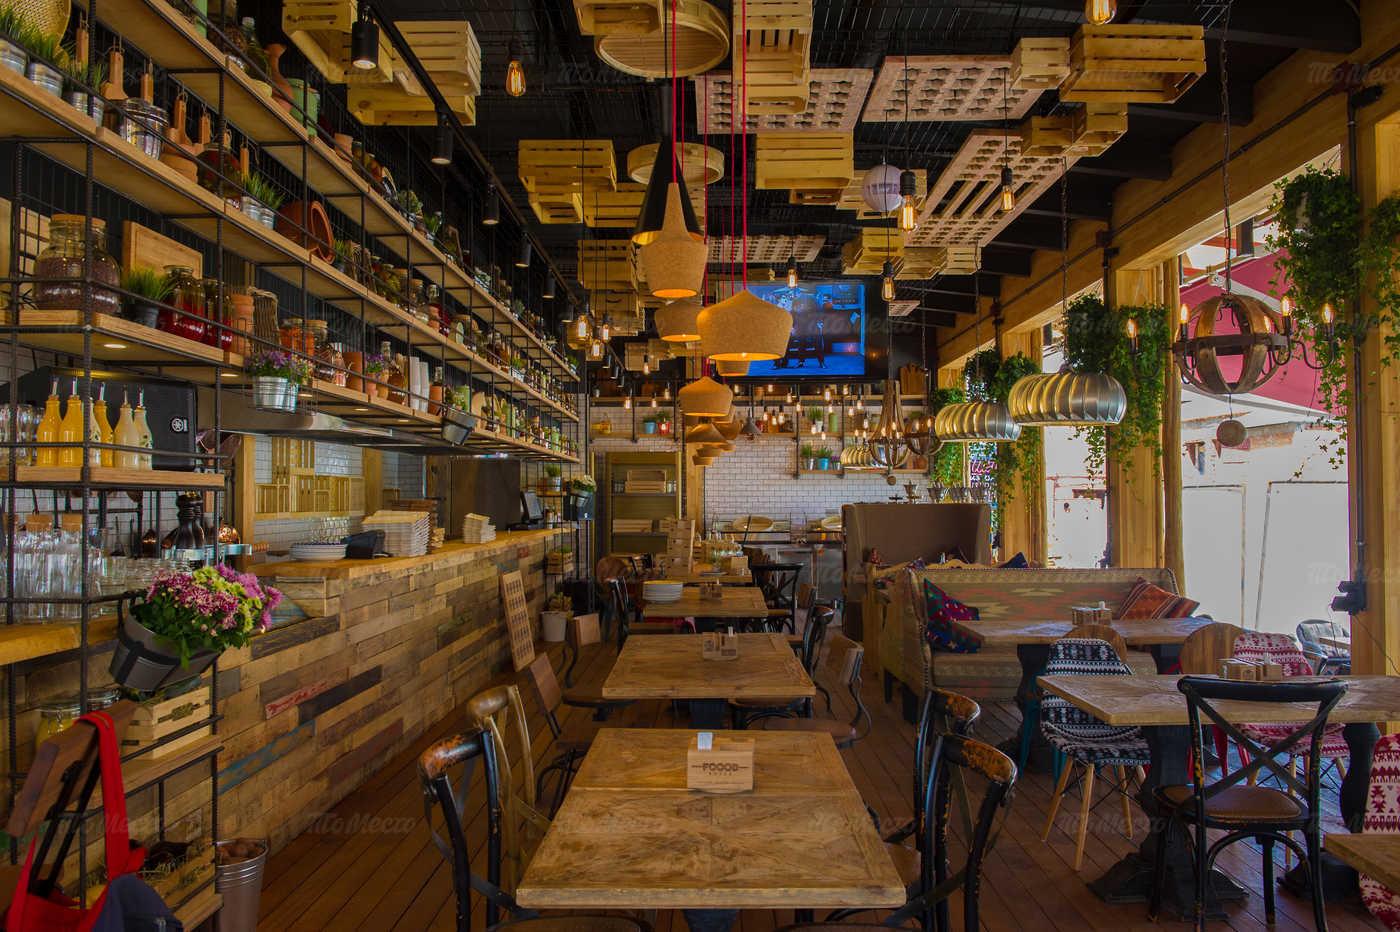 Банкеты ресторана FOOD BAZAR (Фуд базар) на улице Каретный Ряд фото 10